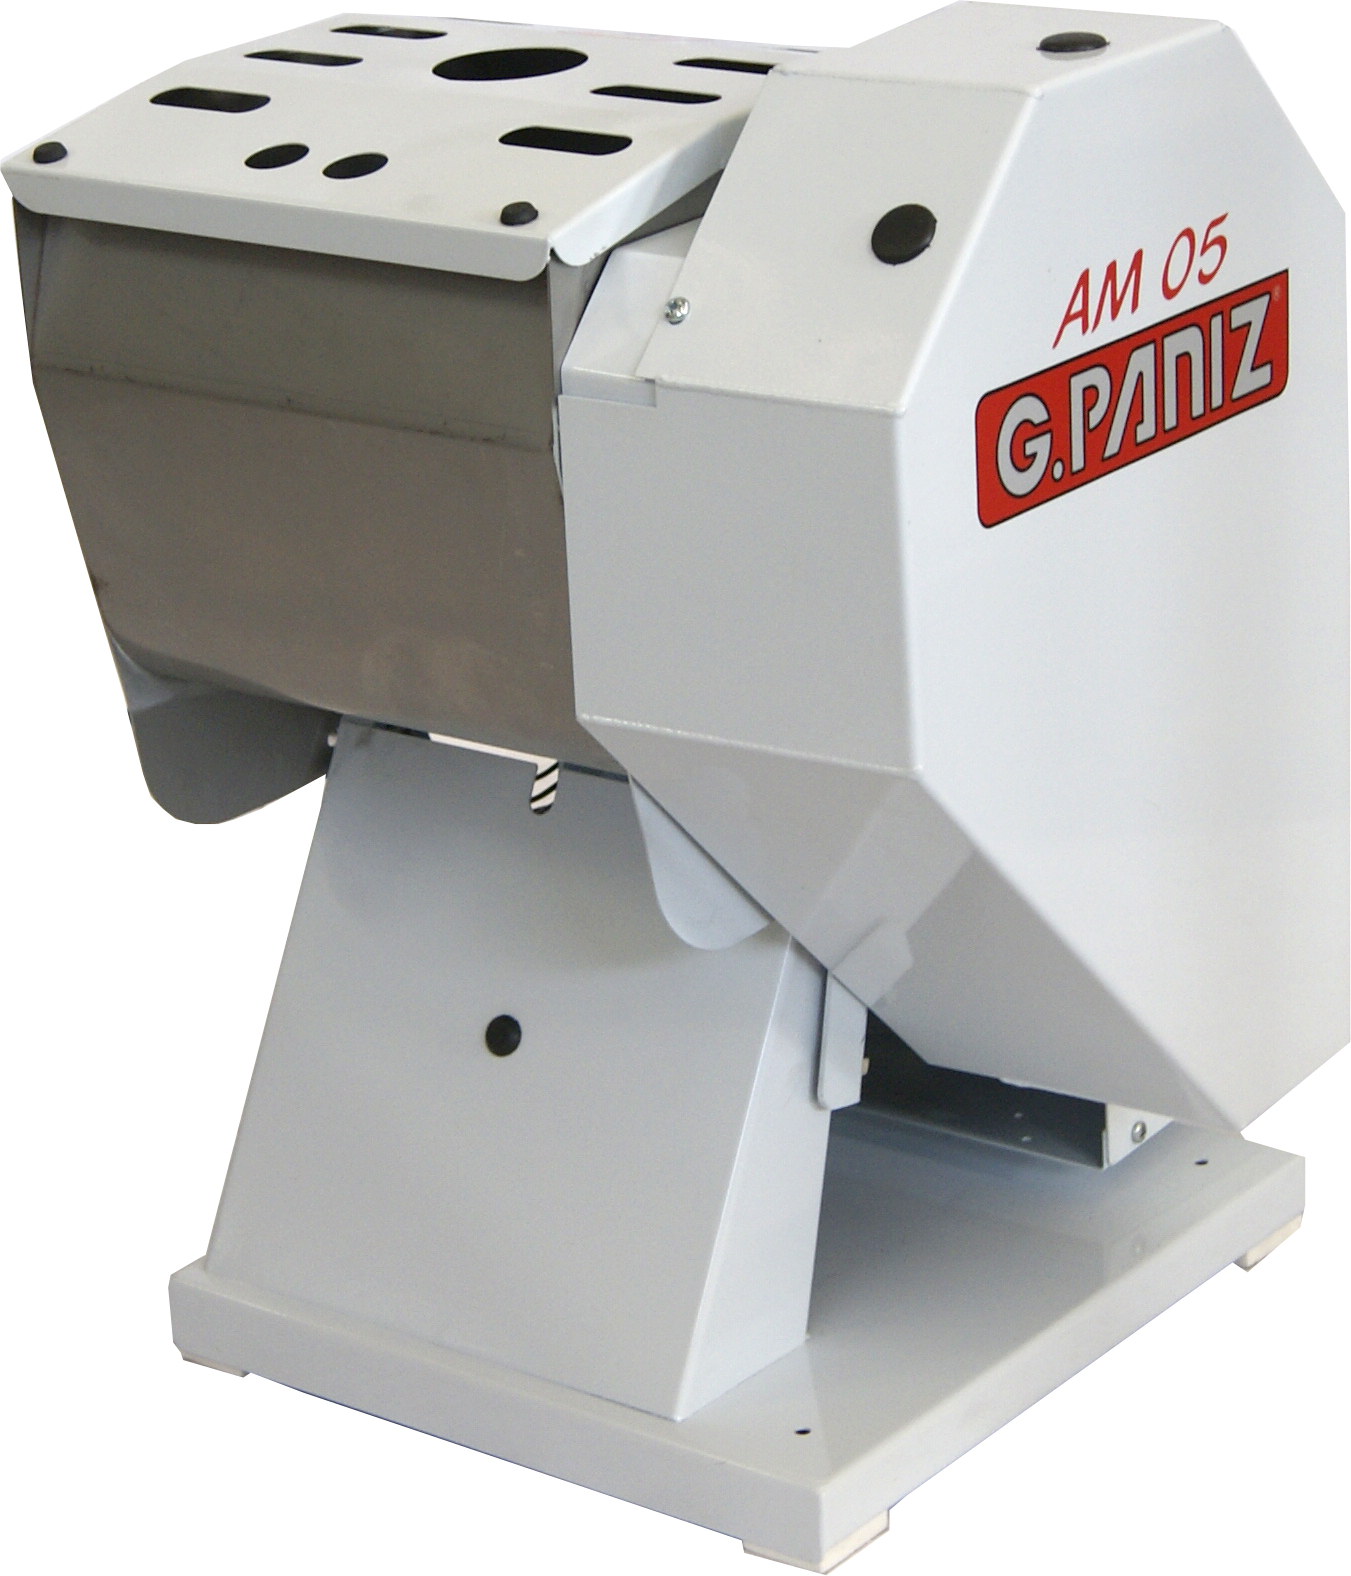 Amassadeira semi-rápida basculante 5kg 1/2cv bivolt AM05 G.Paniz